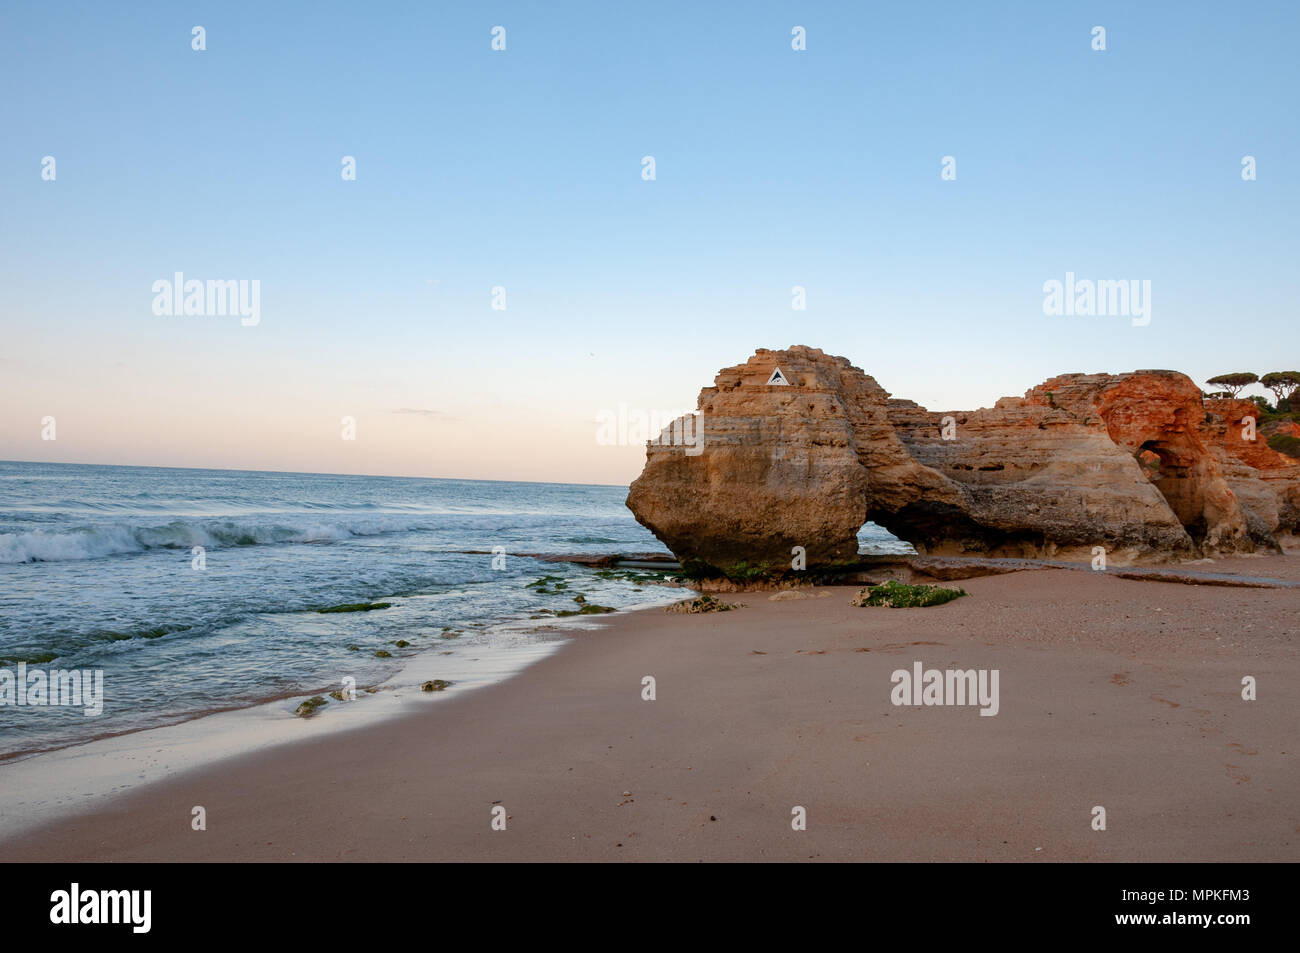 Olhos de Água Rock Formation - Stock Image